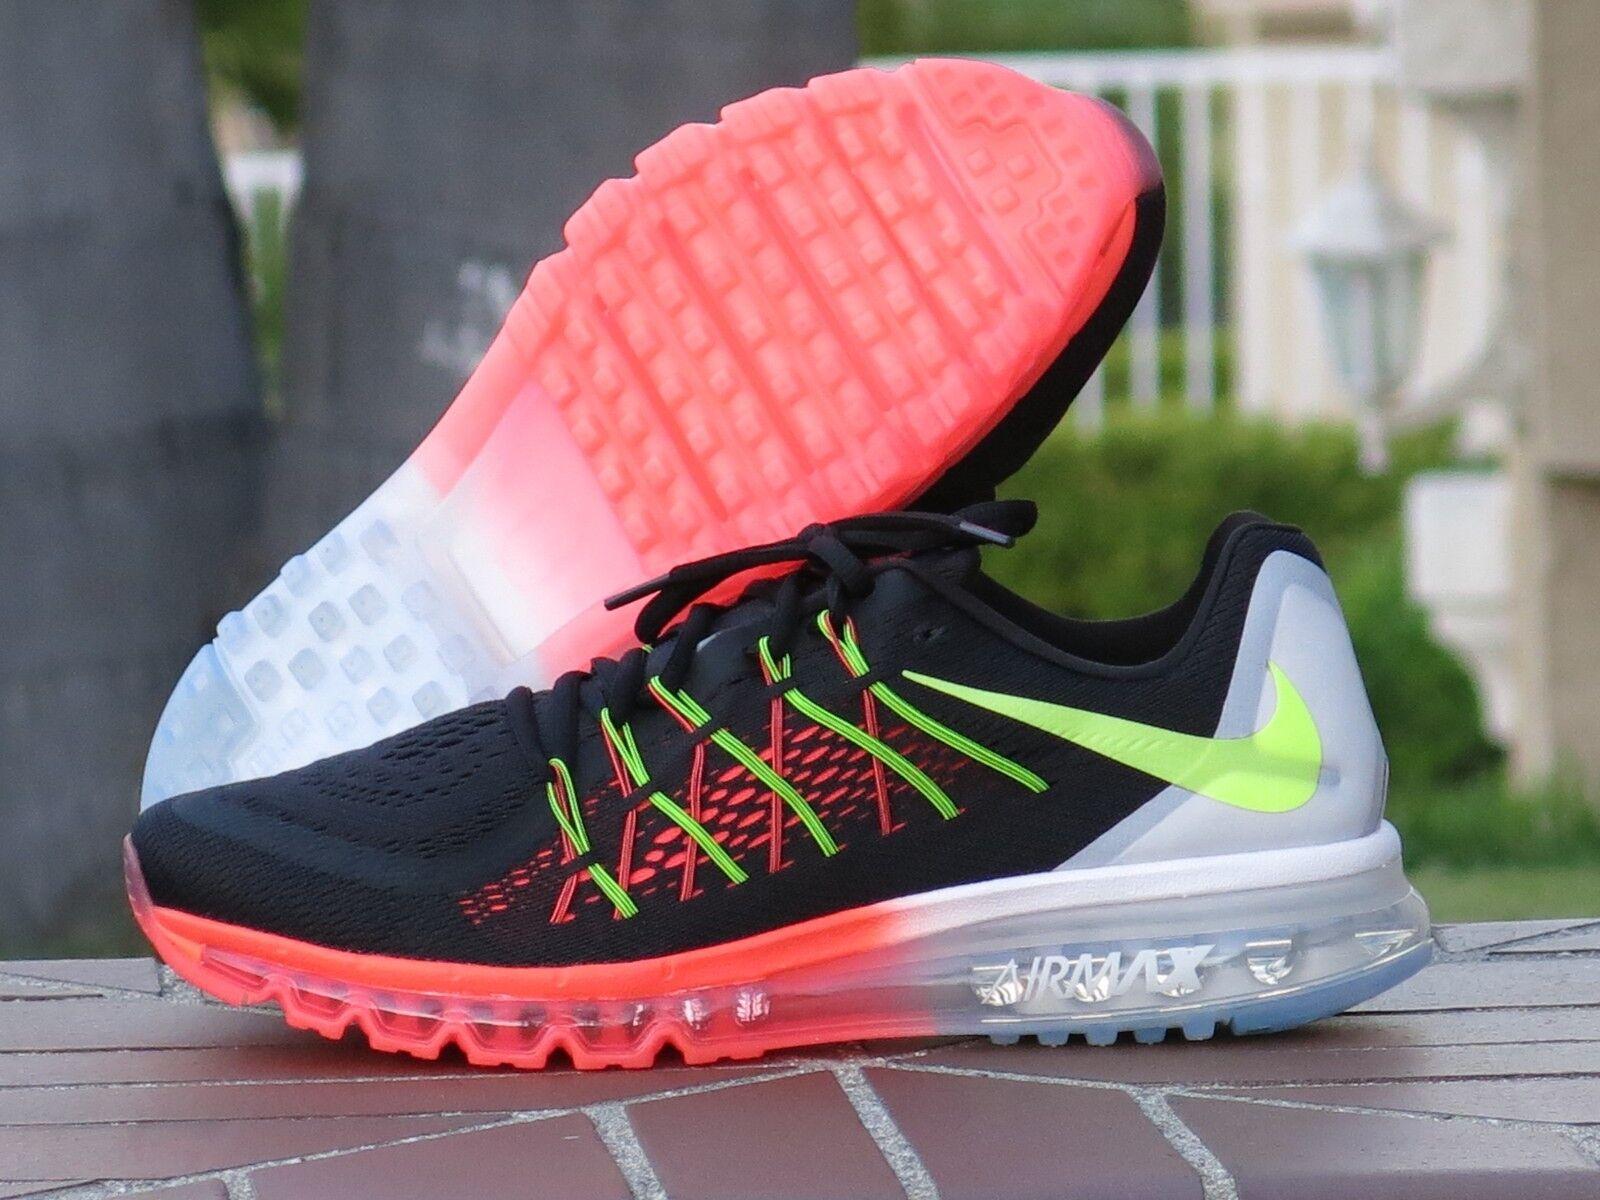 Nike Air Max Men's Running, Cross Training Sneakers 698902-007 SZ 11.5